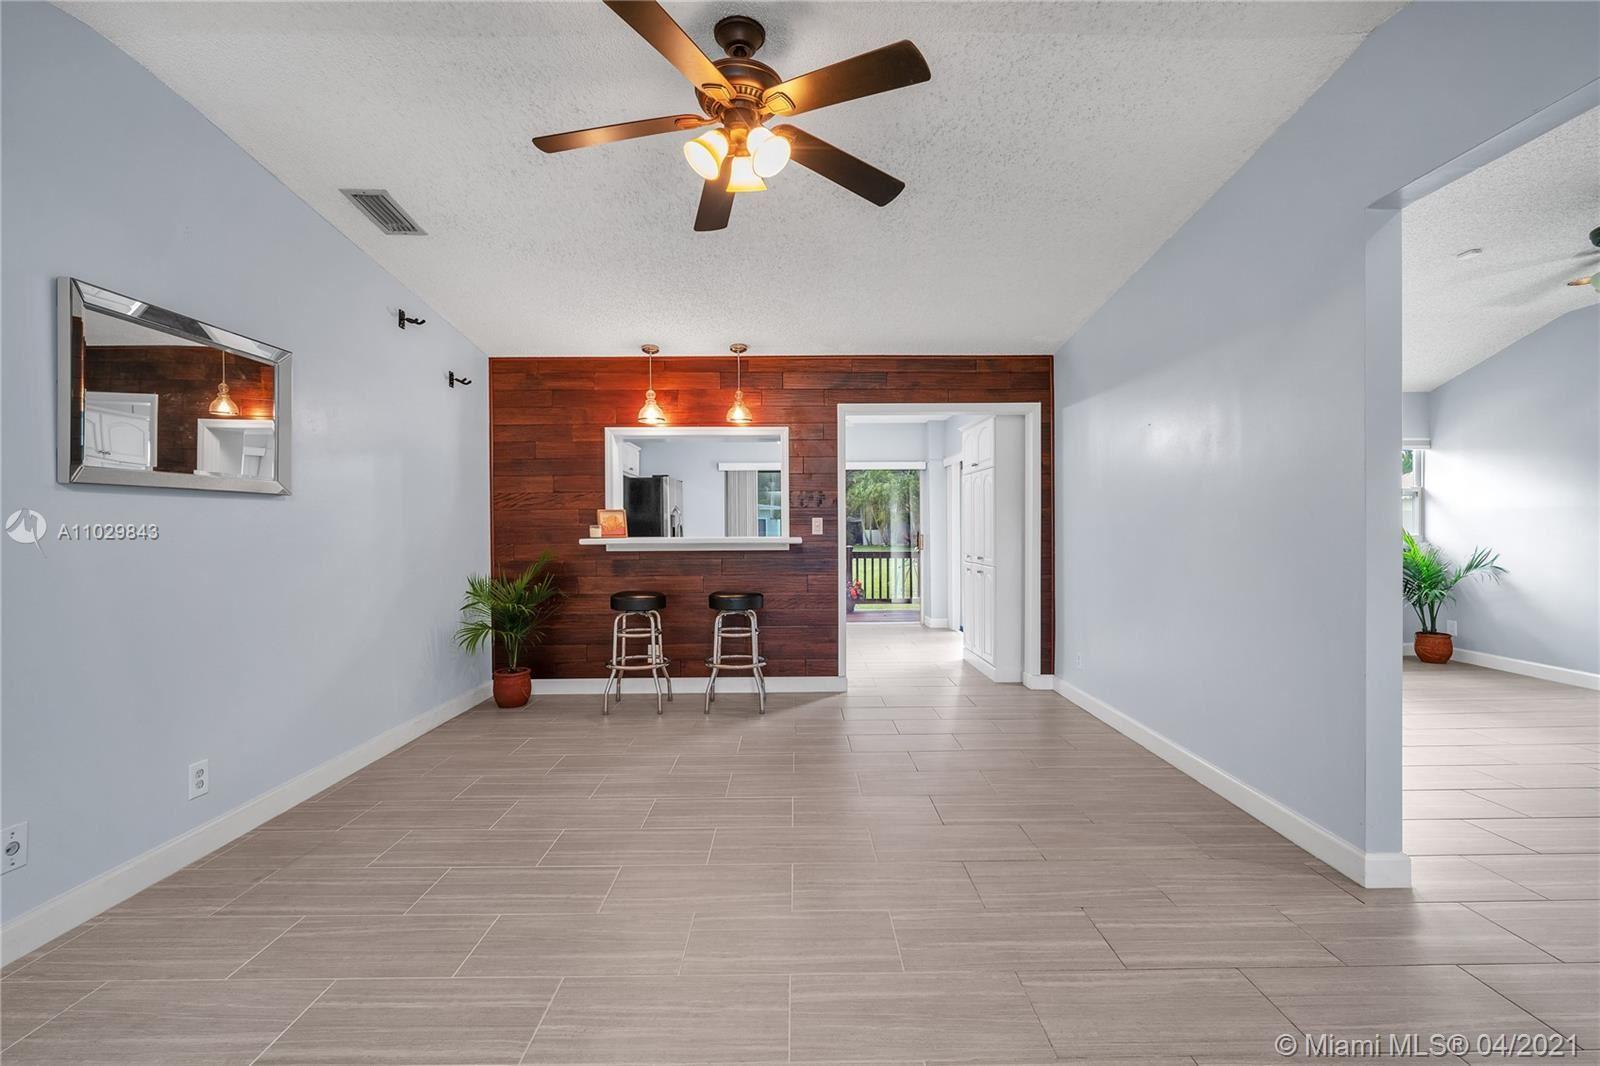 Photo of 370 E Lakewood Cir E #D, Margate, FL 33063 (MLS # A11029843)